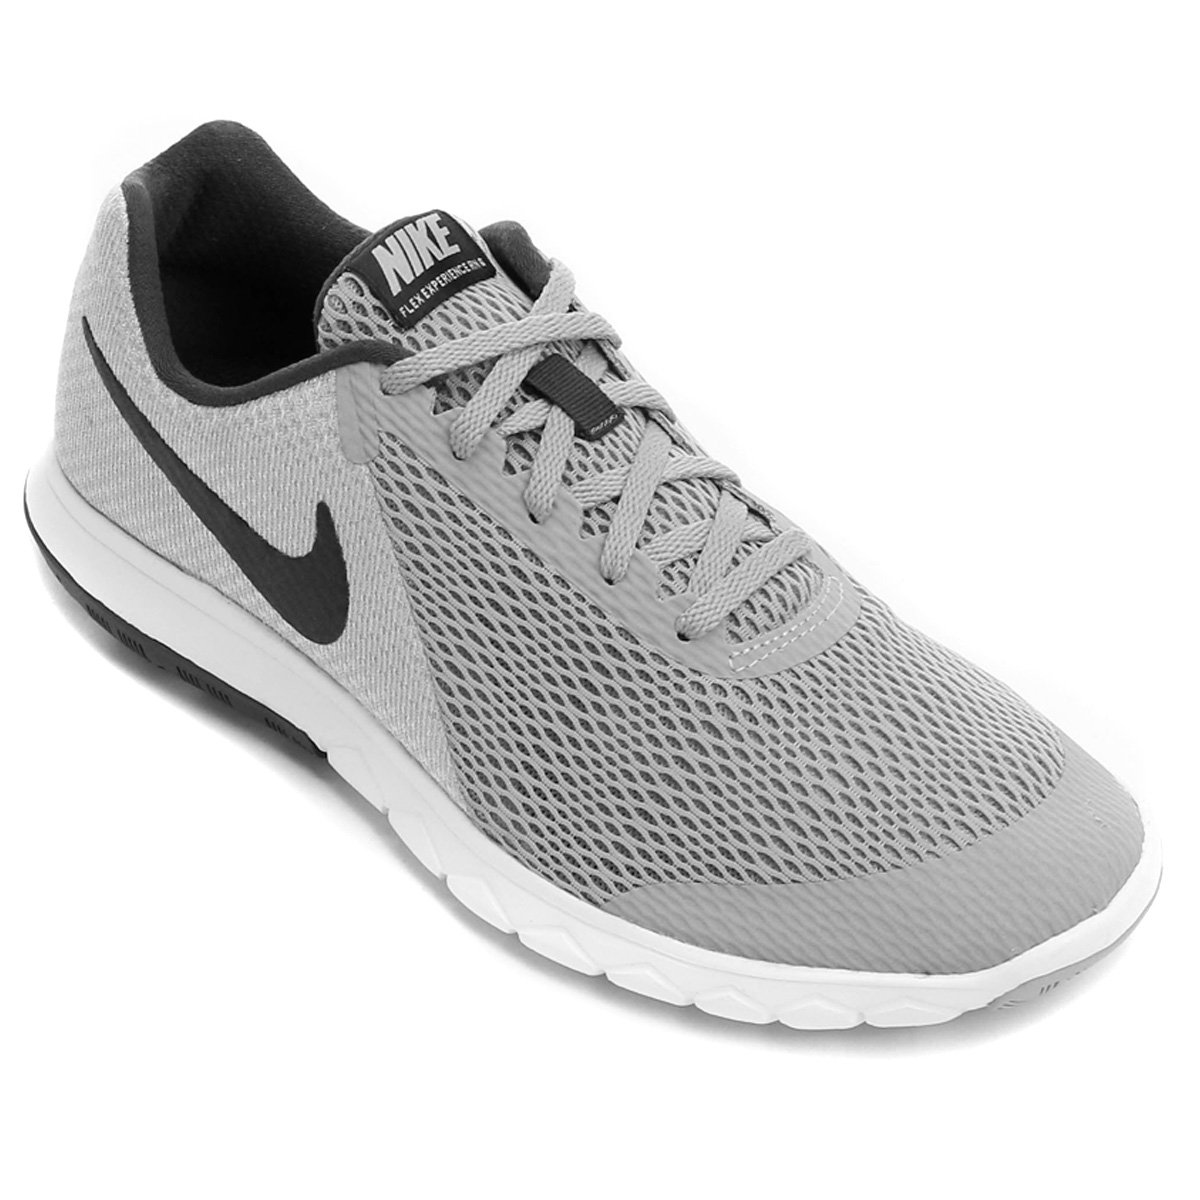 9bbfbe116f3 Tênis Nike Flex Experience Rn 6 Masculino - Cinza e Preto - Compre Agora